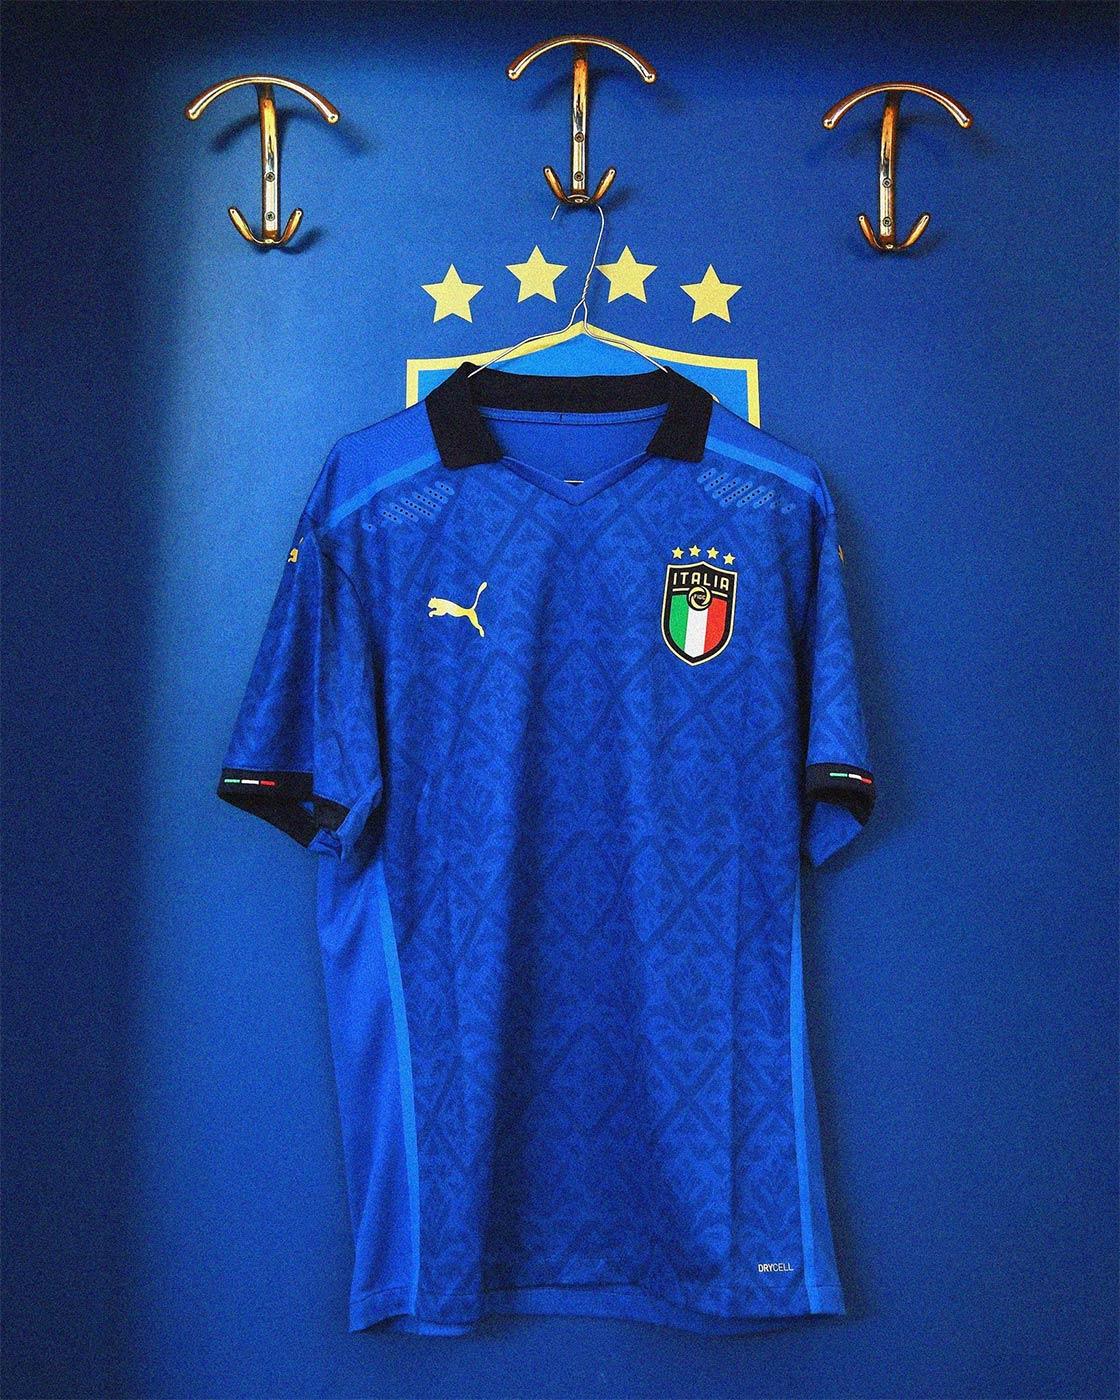 Maglia Italia Europei 2021, Puma punta sui fregi del Rinascimento